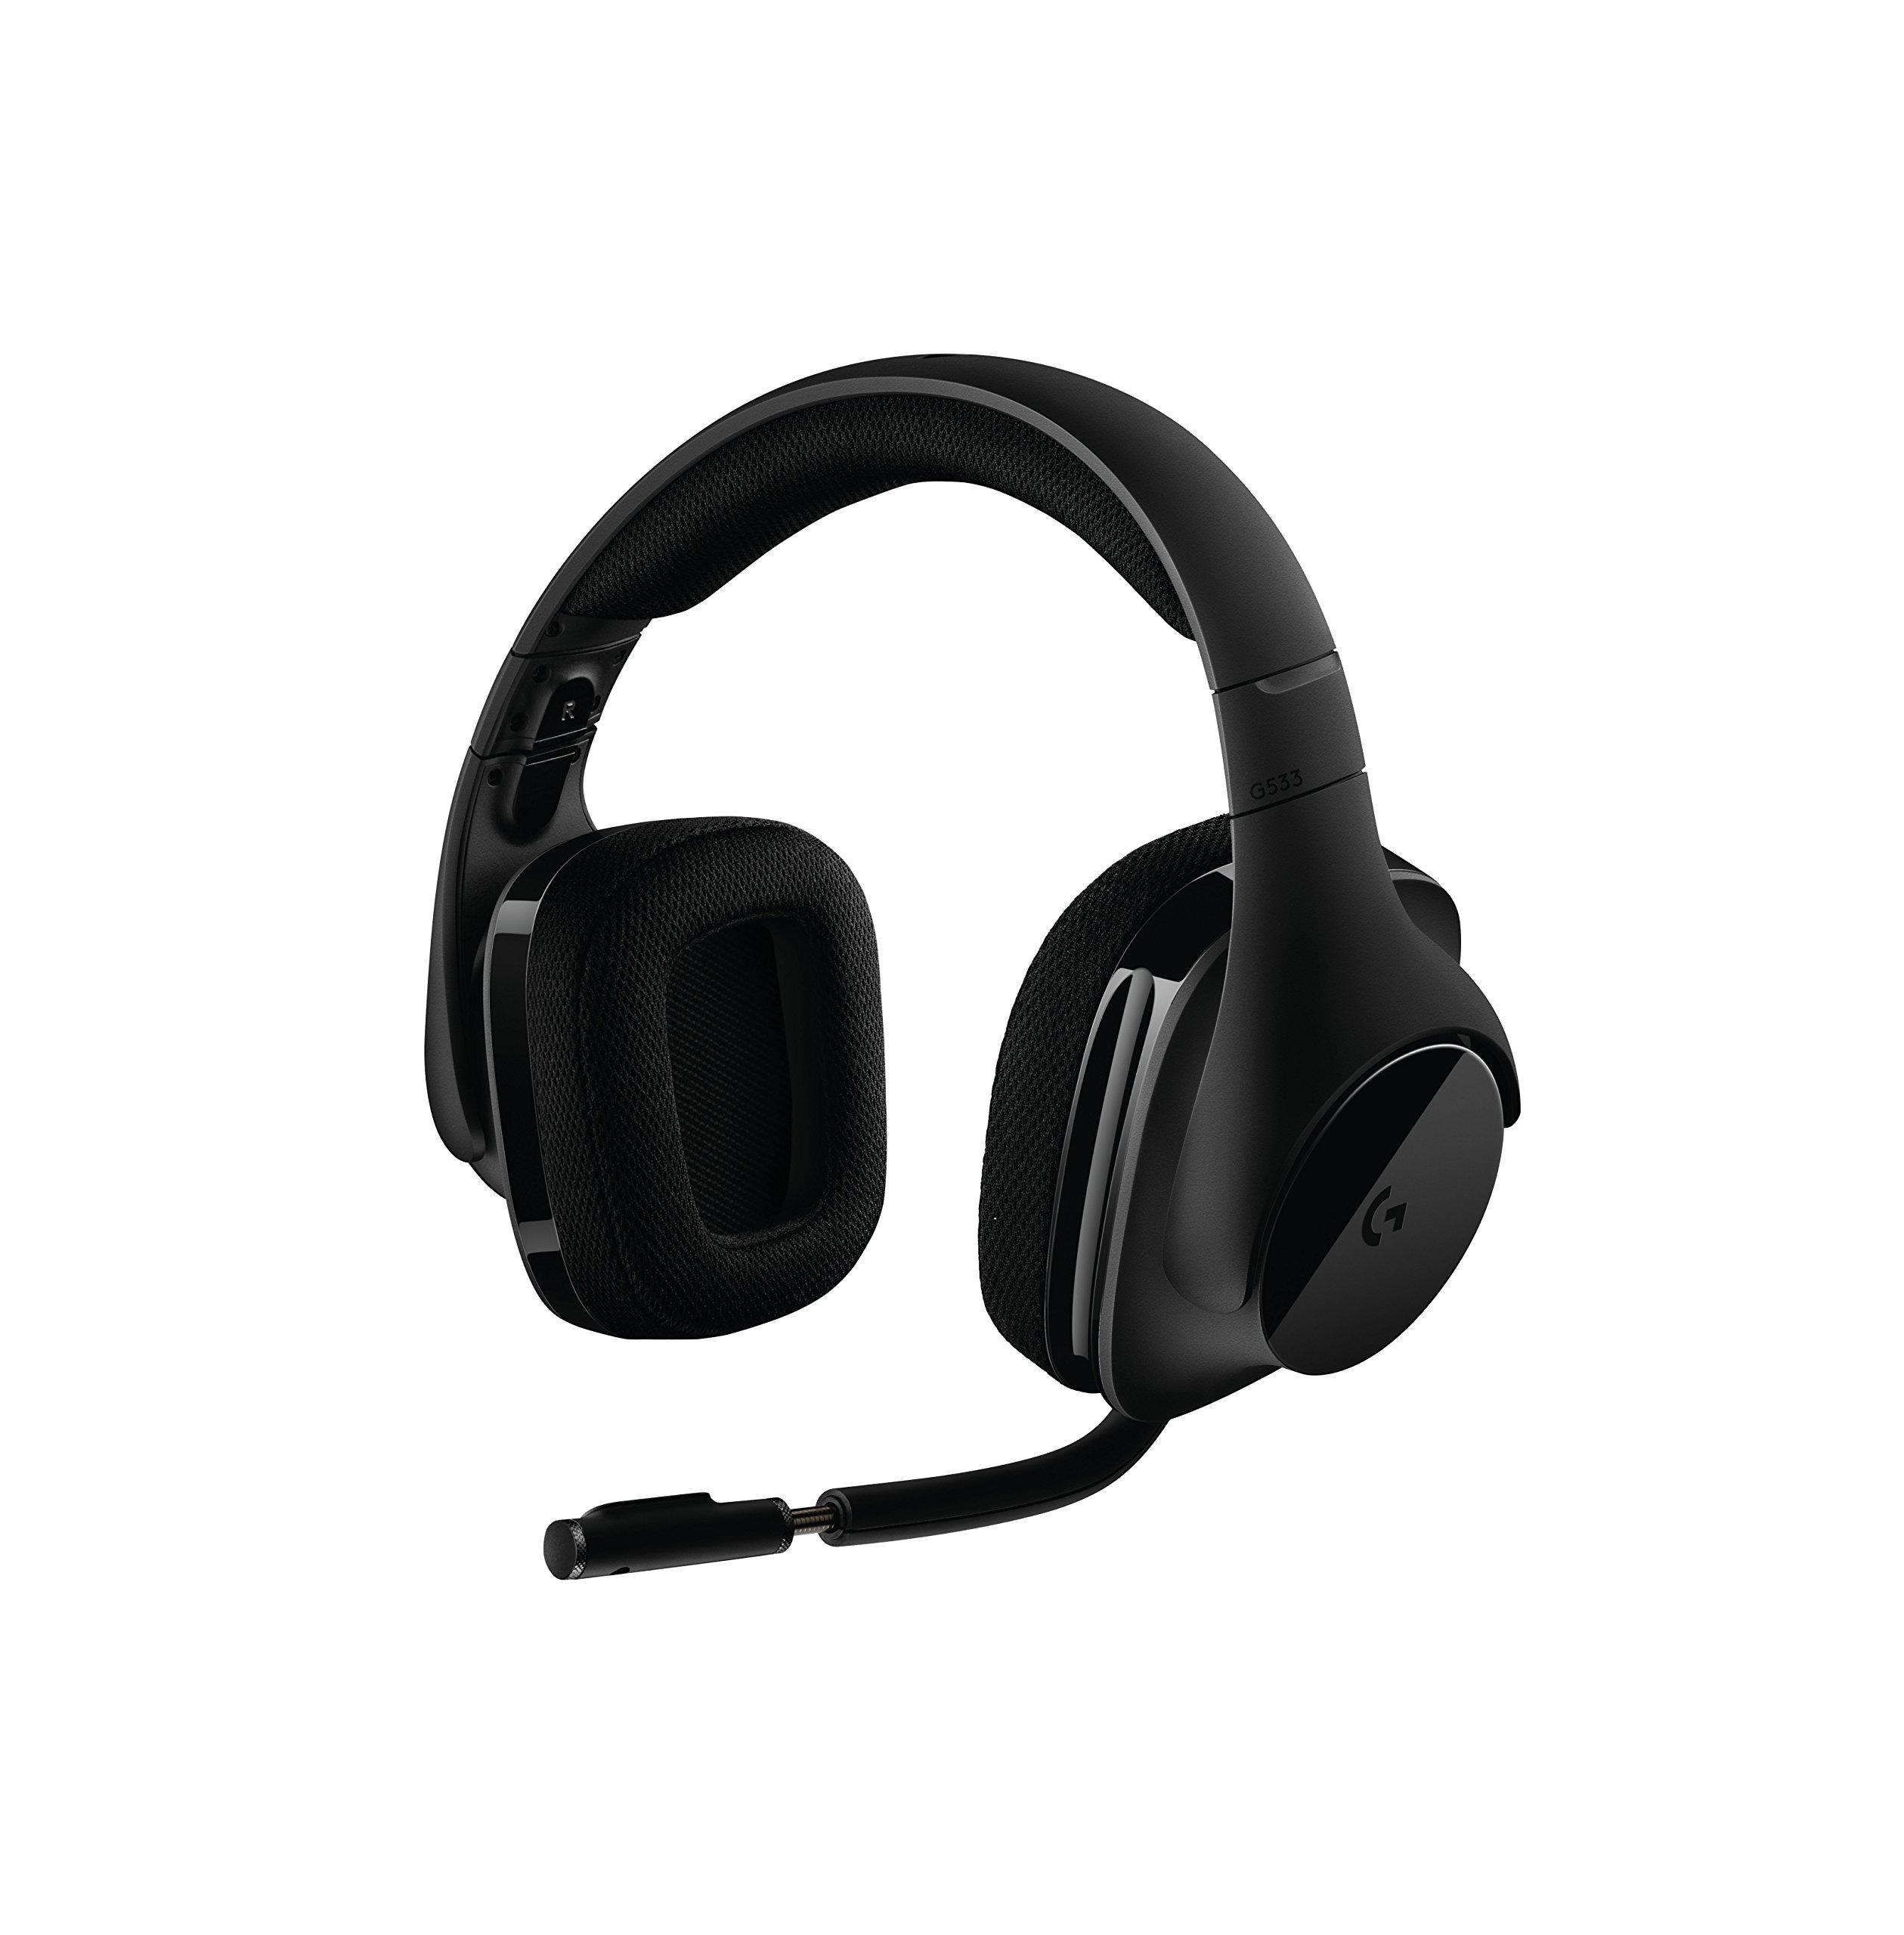 Logitech G533 Wireless Gaming Headset - DTS 7.1 Surround Sound - Pro-G Audio Drivers by Logitech G